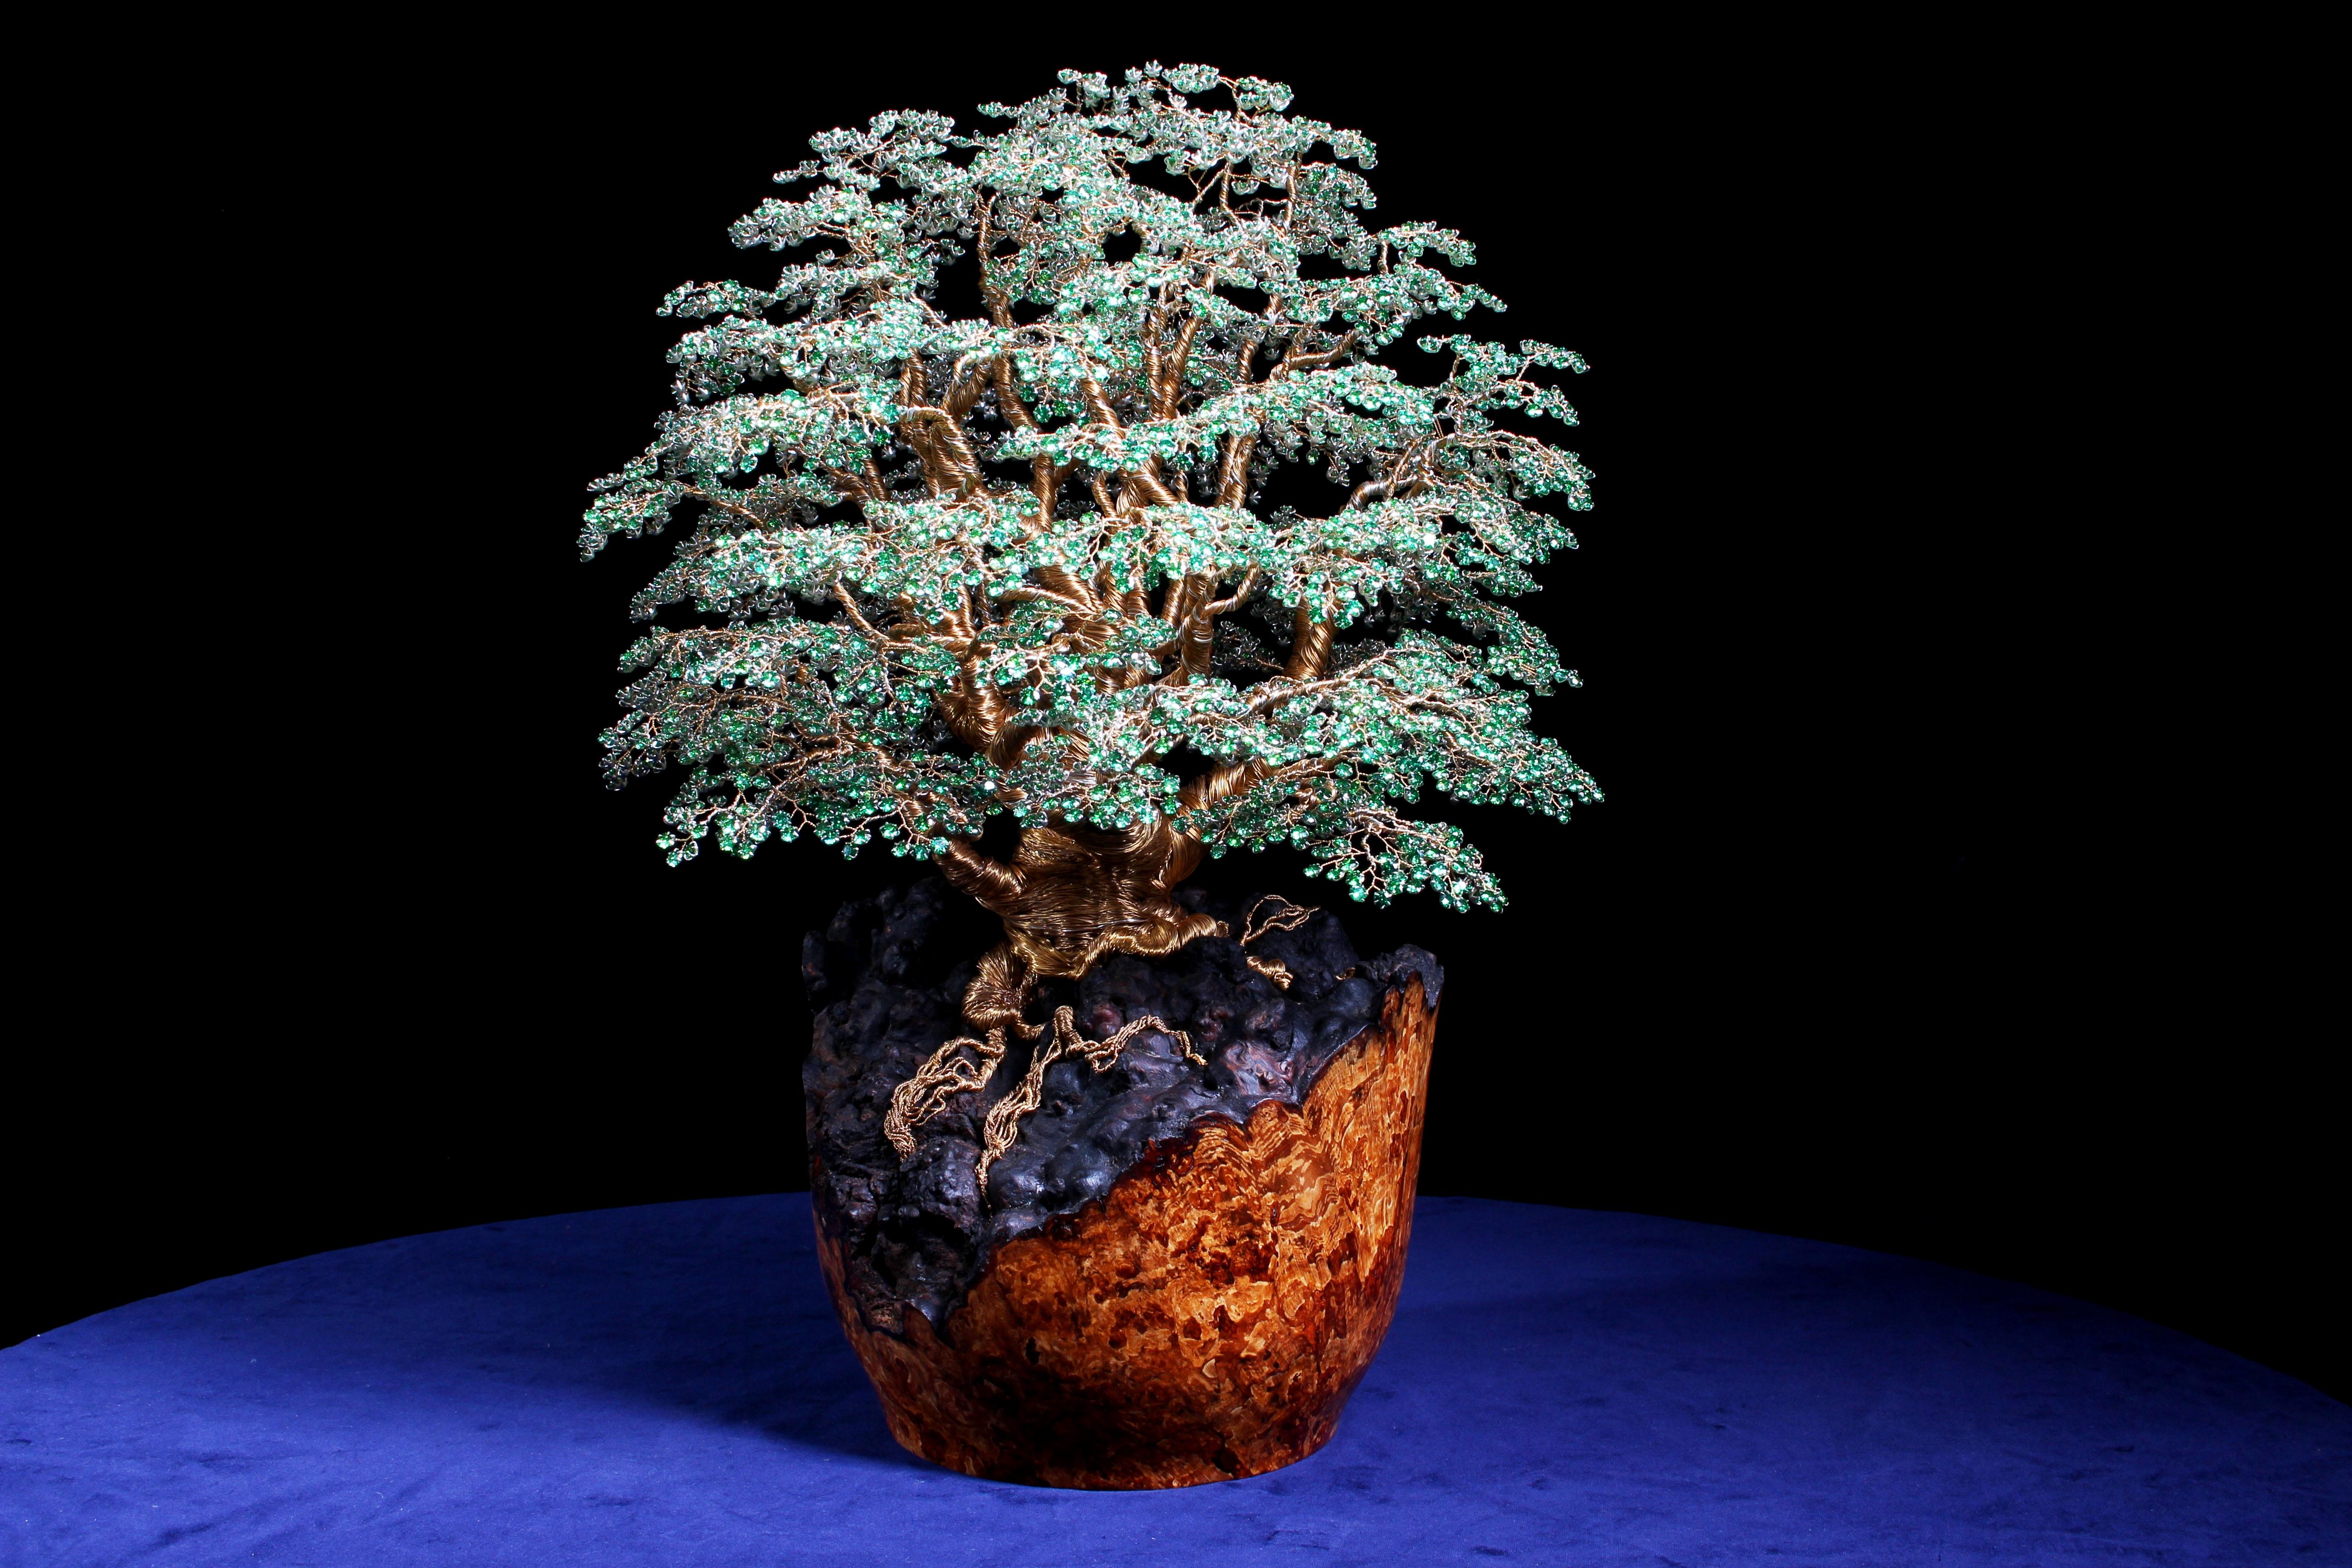 alarik greenland tree wire gemstones by